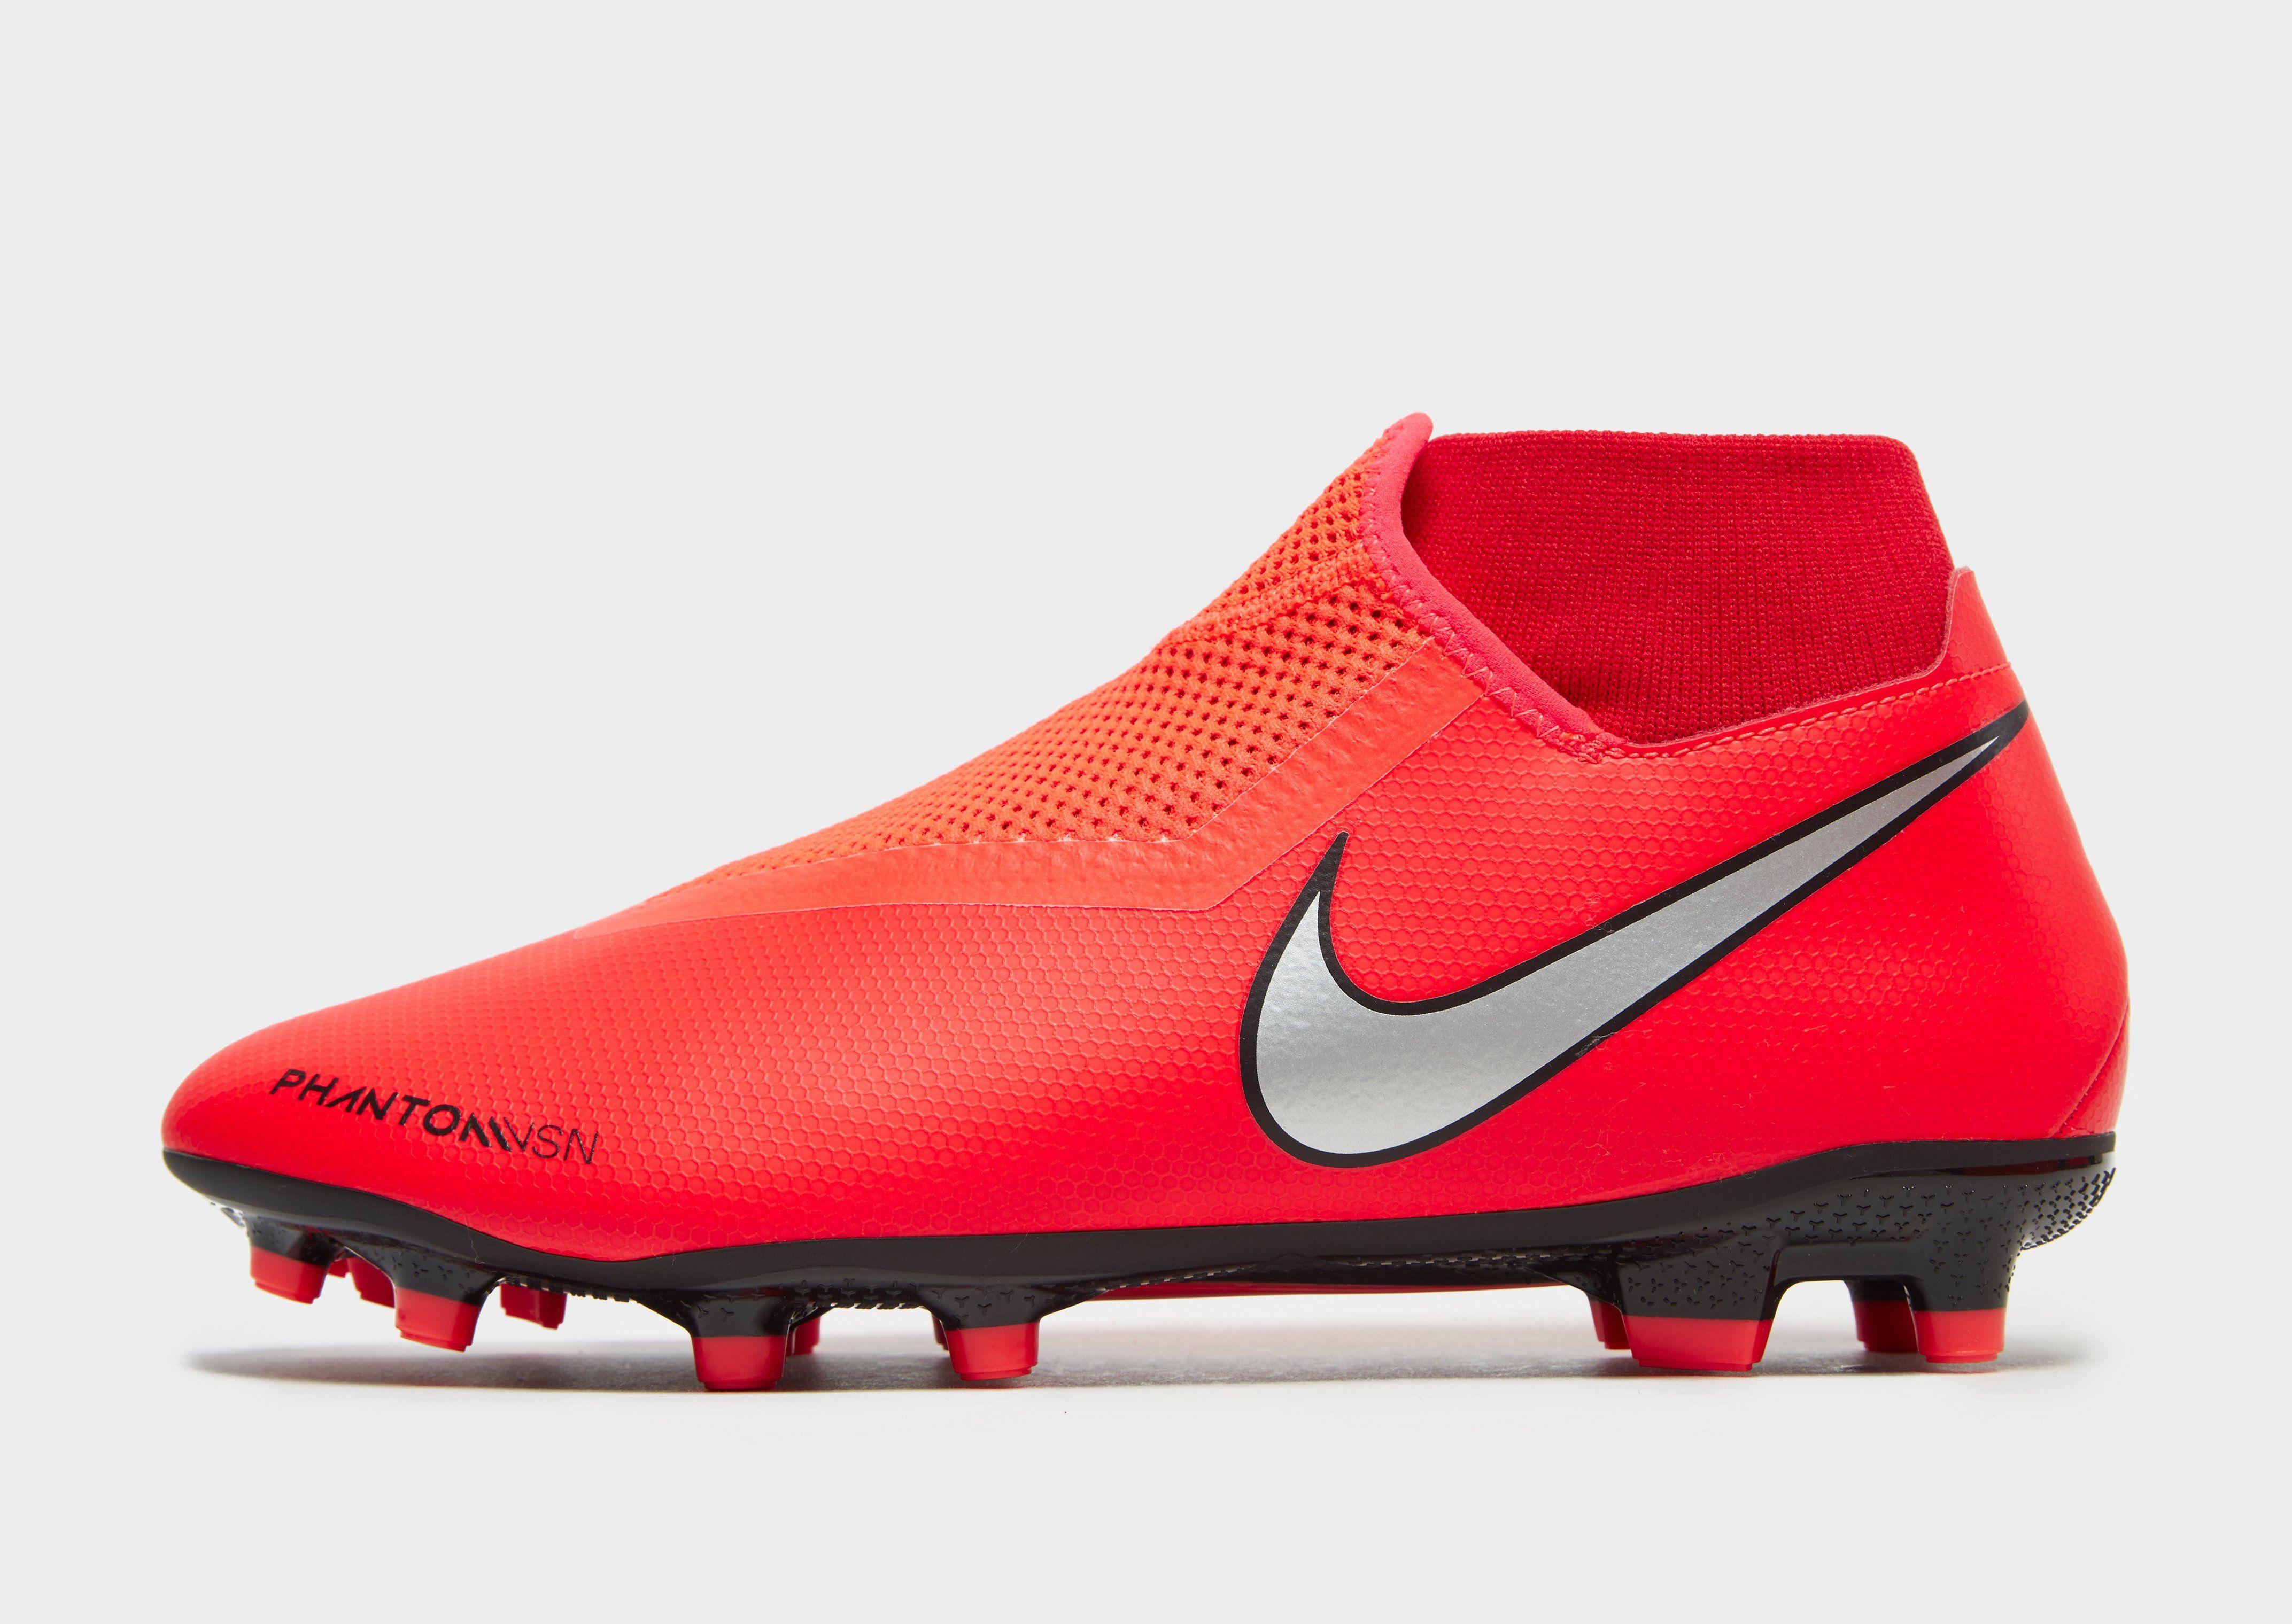 NIKE Nike PhantomVSN Academy Dynamic Fit MG Multi-Ground Football Boot